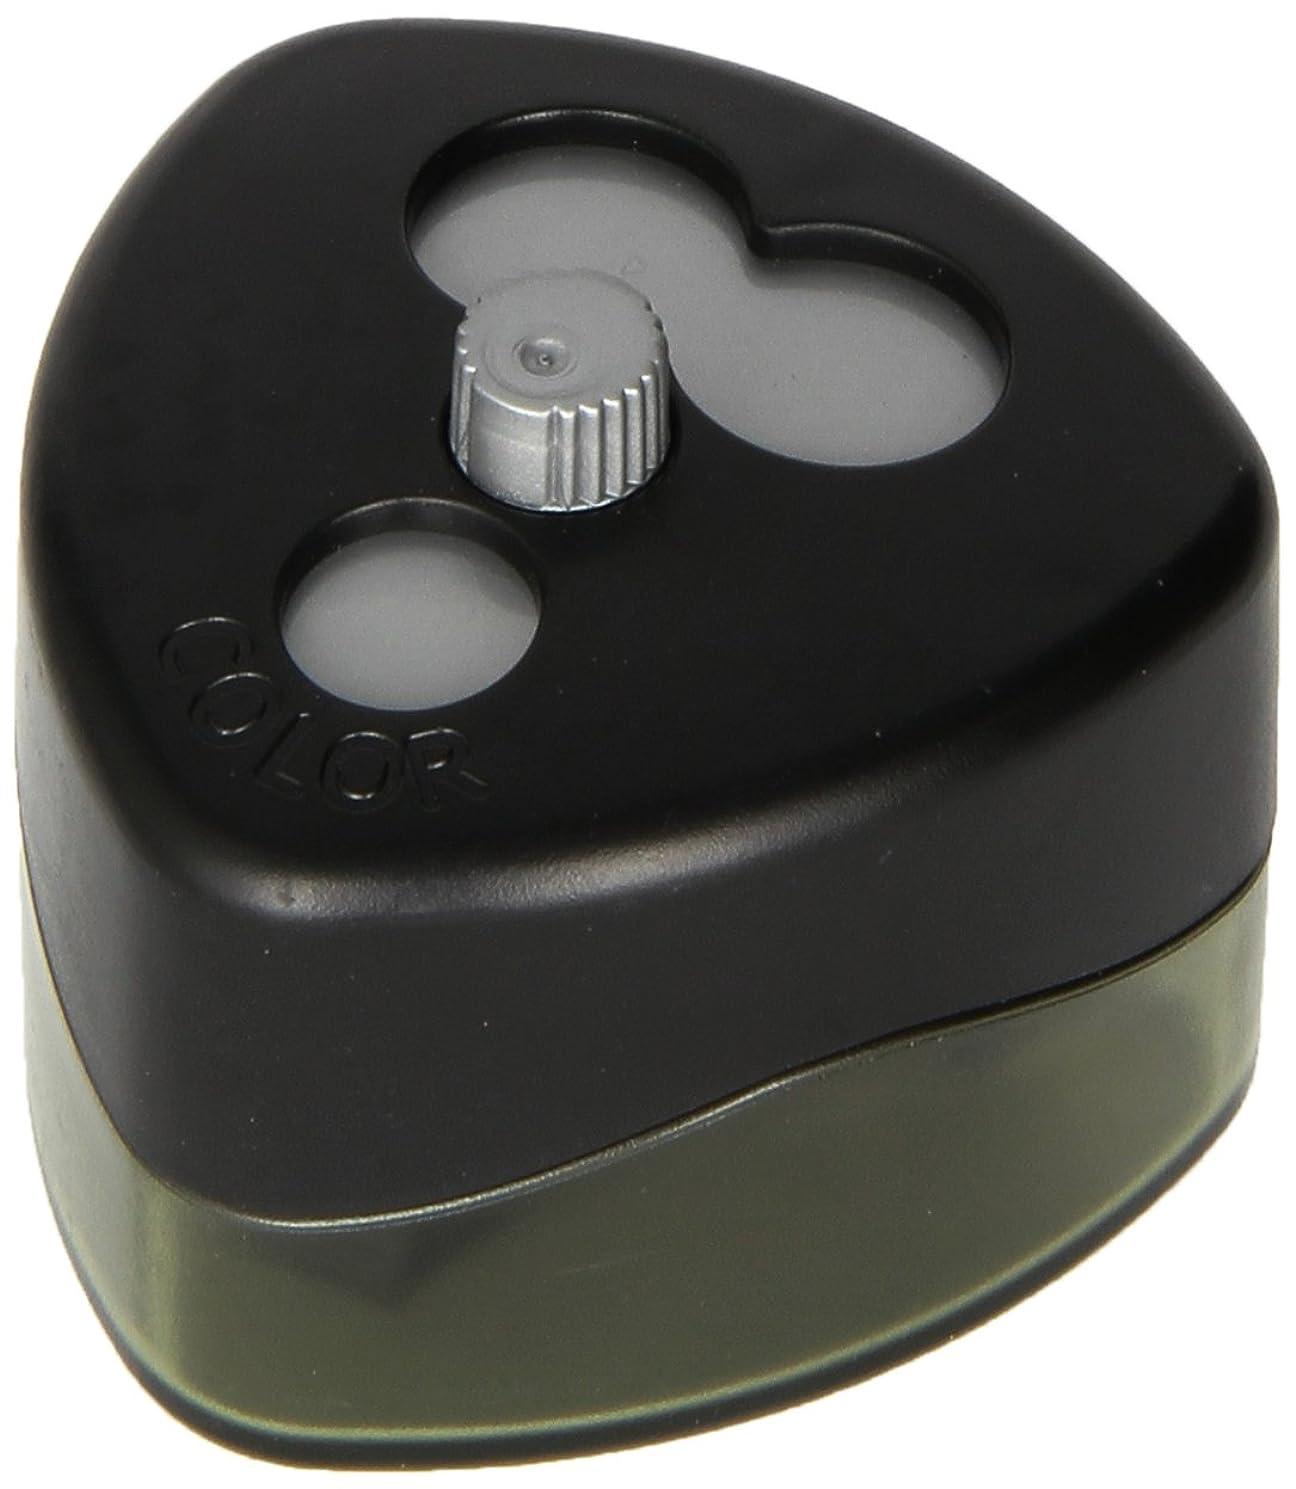 M+R 709590000?Sharpener Plastic Triple Screw Top